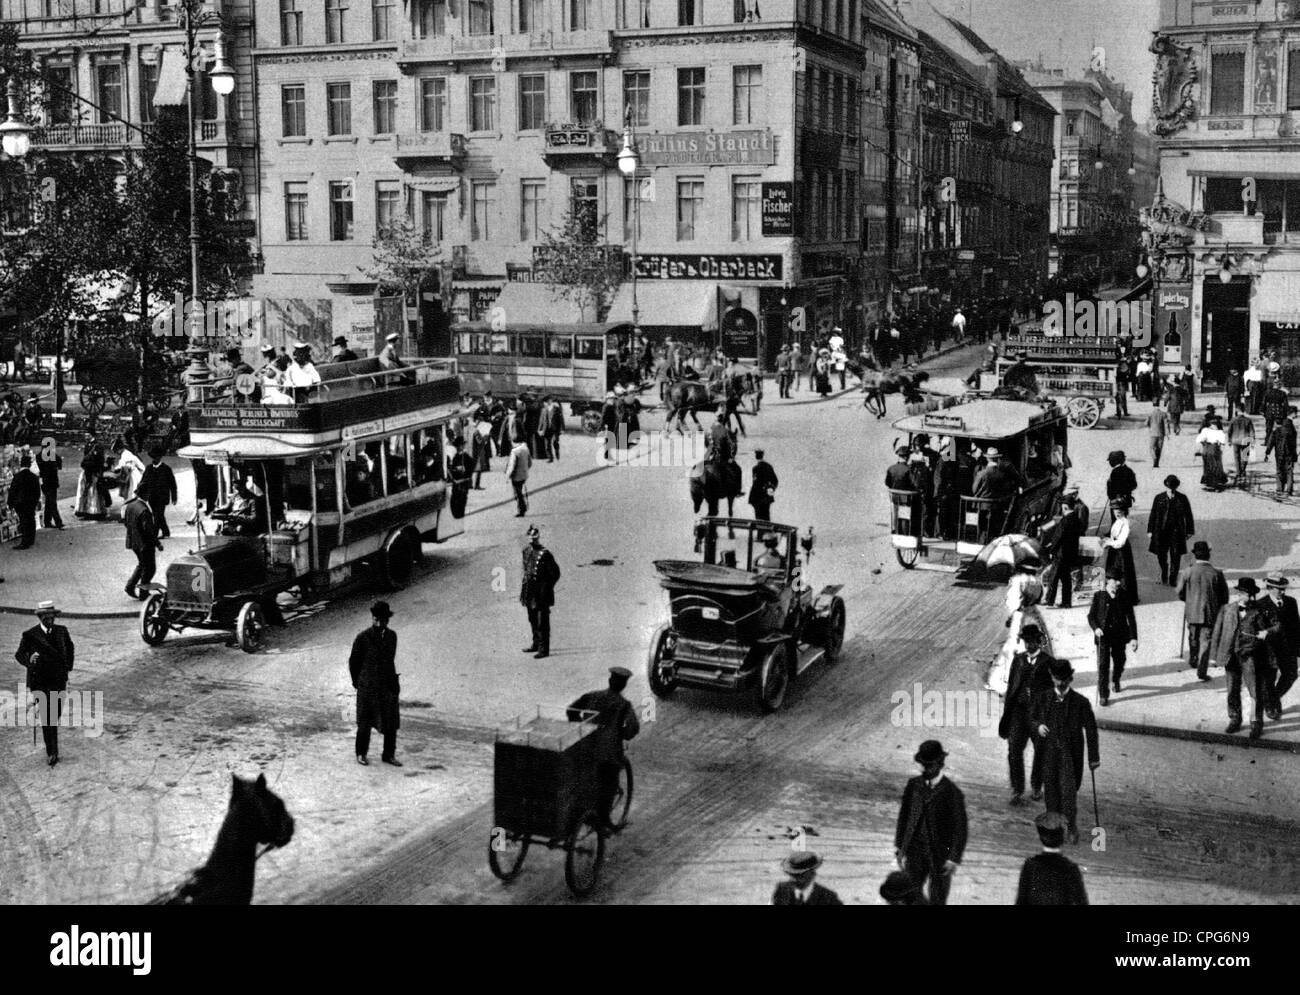 geography / travel, Germany, Berlin, streets, Unter den Linden - Friedrichstrasse, before the First World War, street - Stock Image